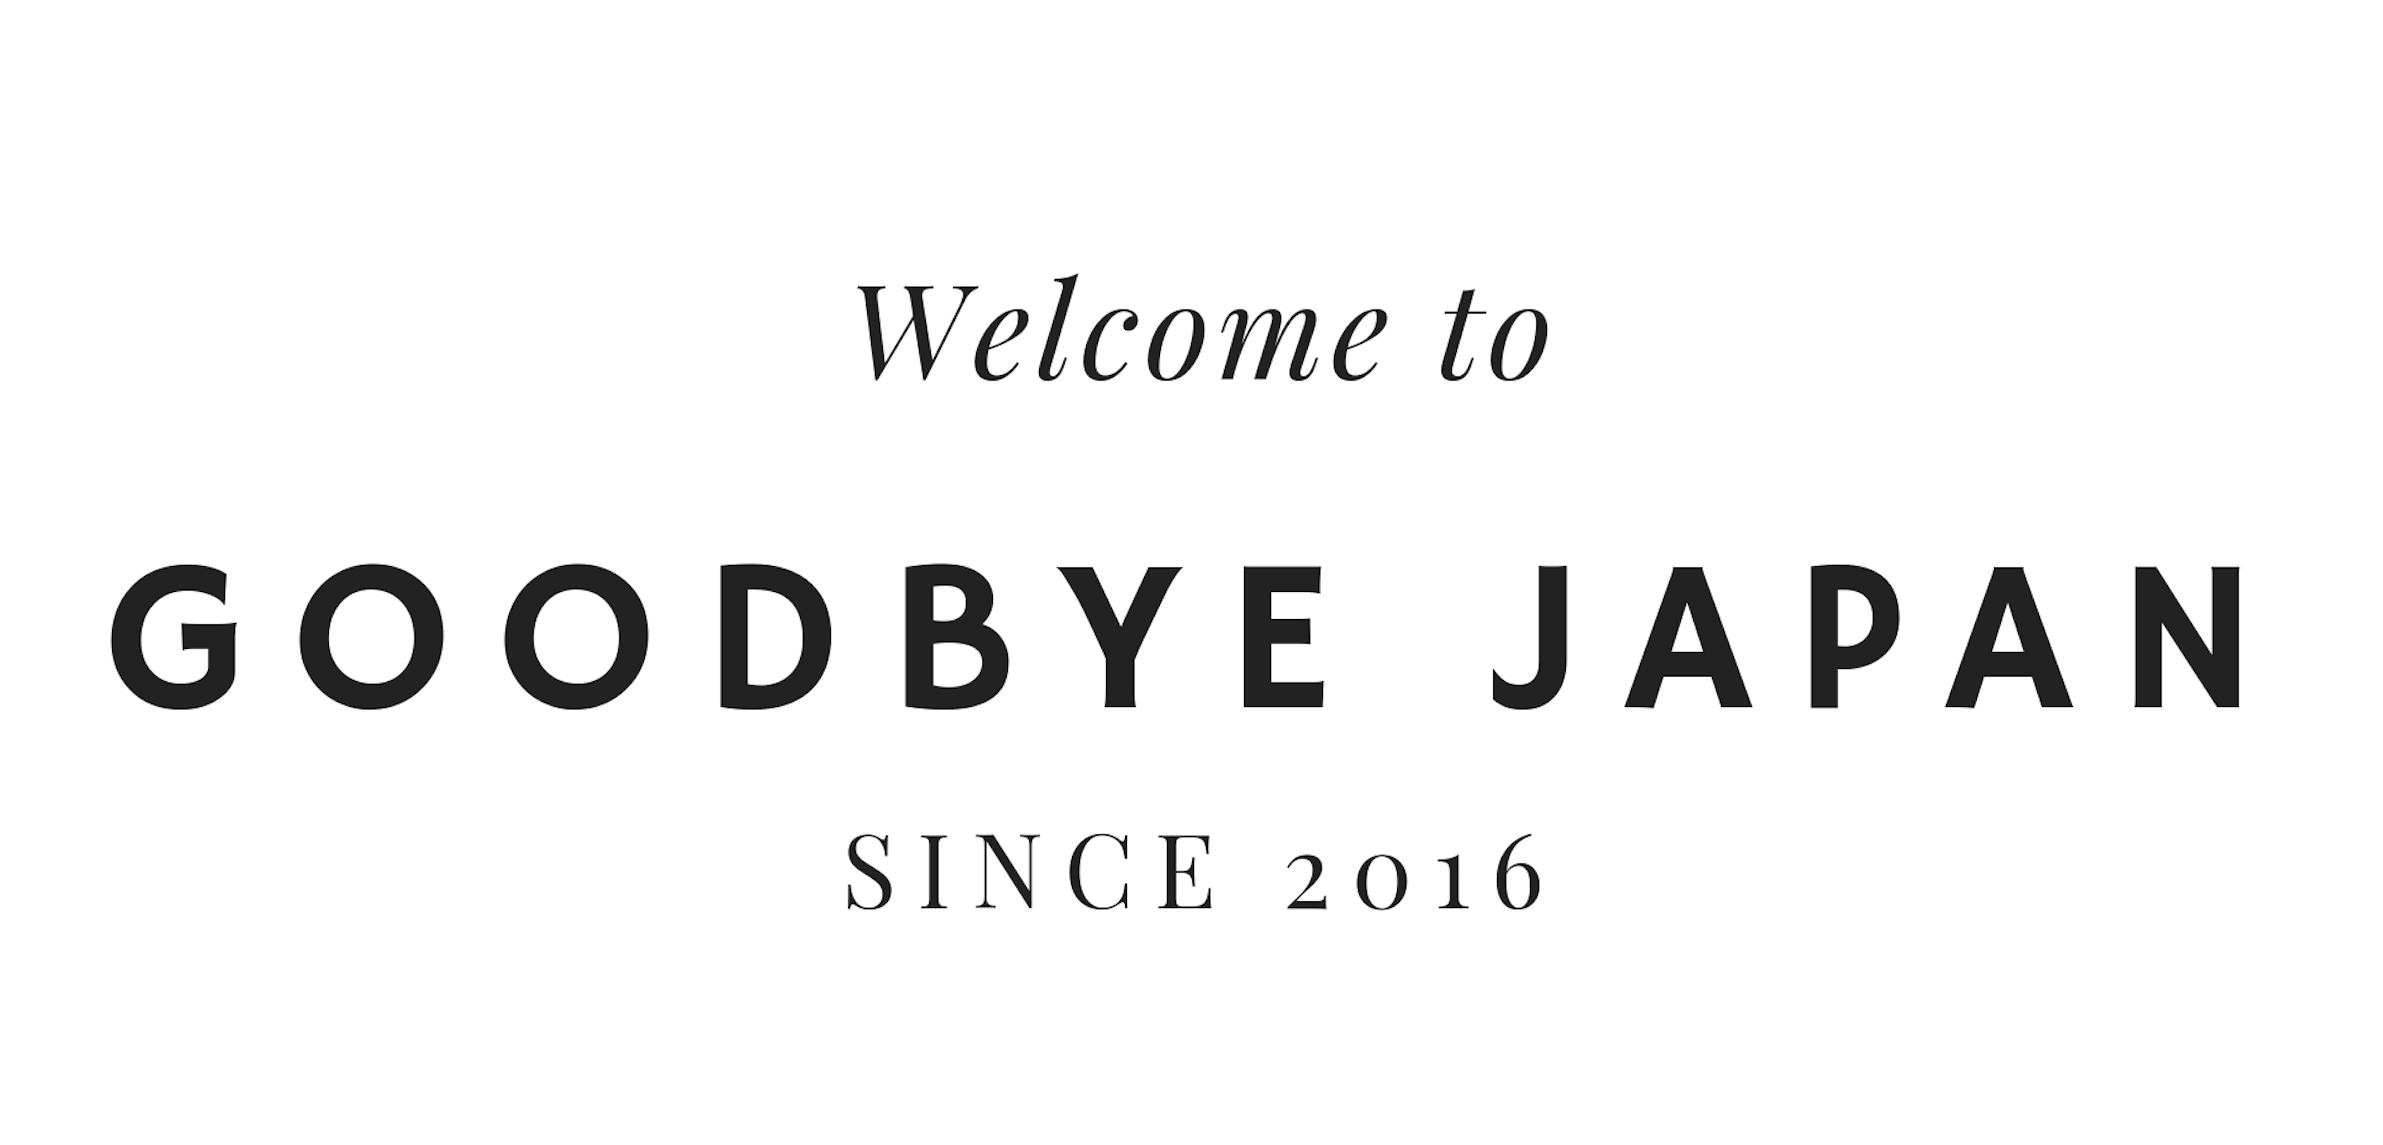 Goodbye Japan